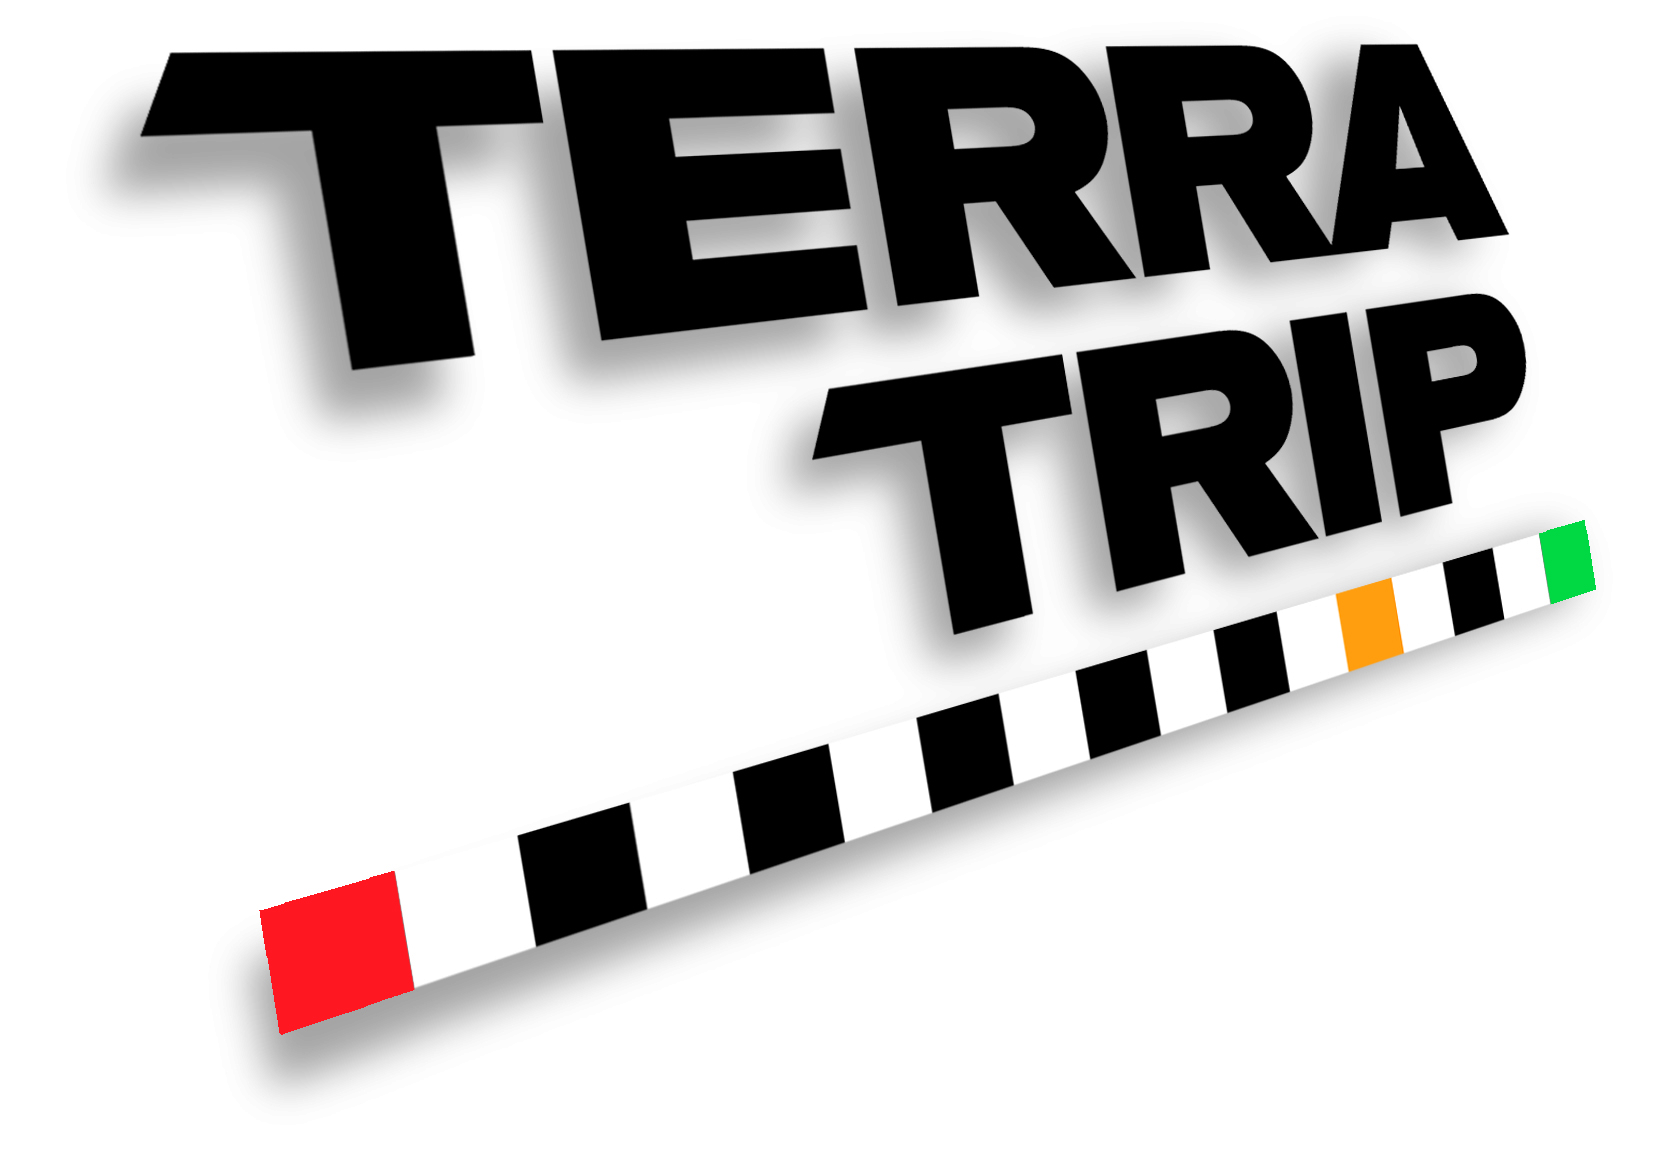 tt-logo.jpg